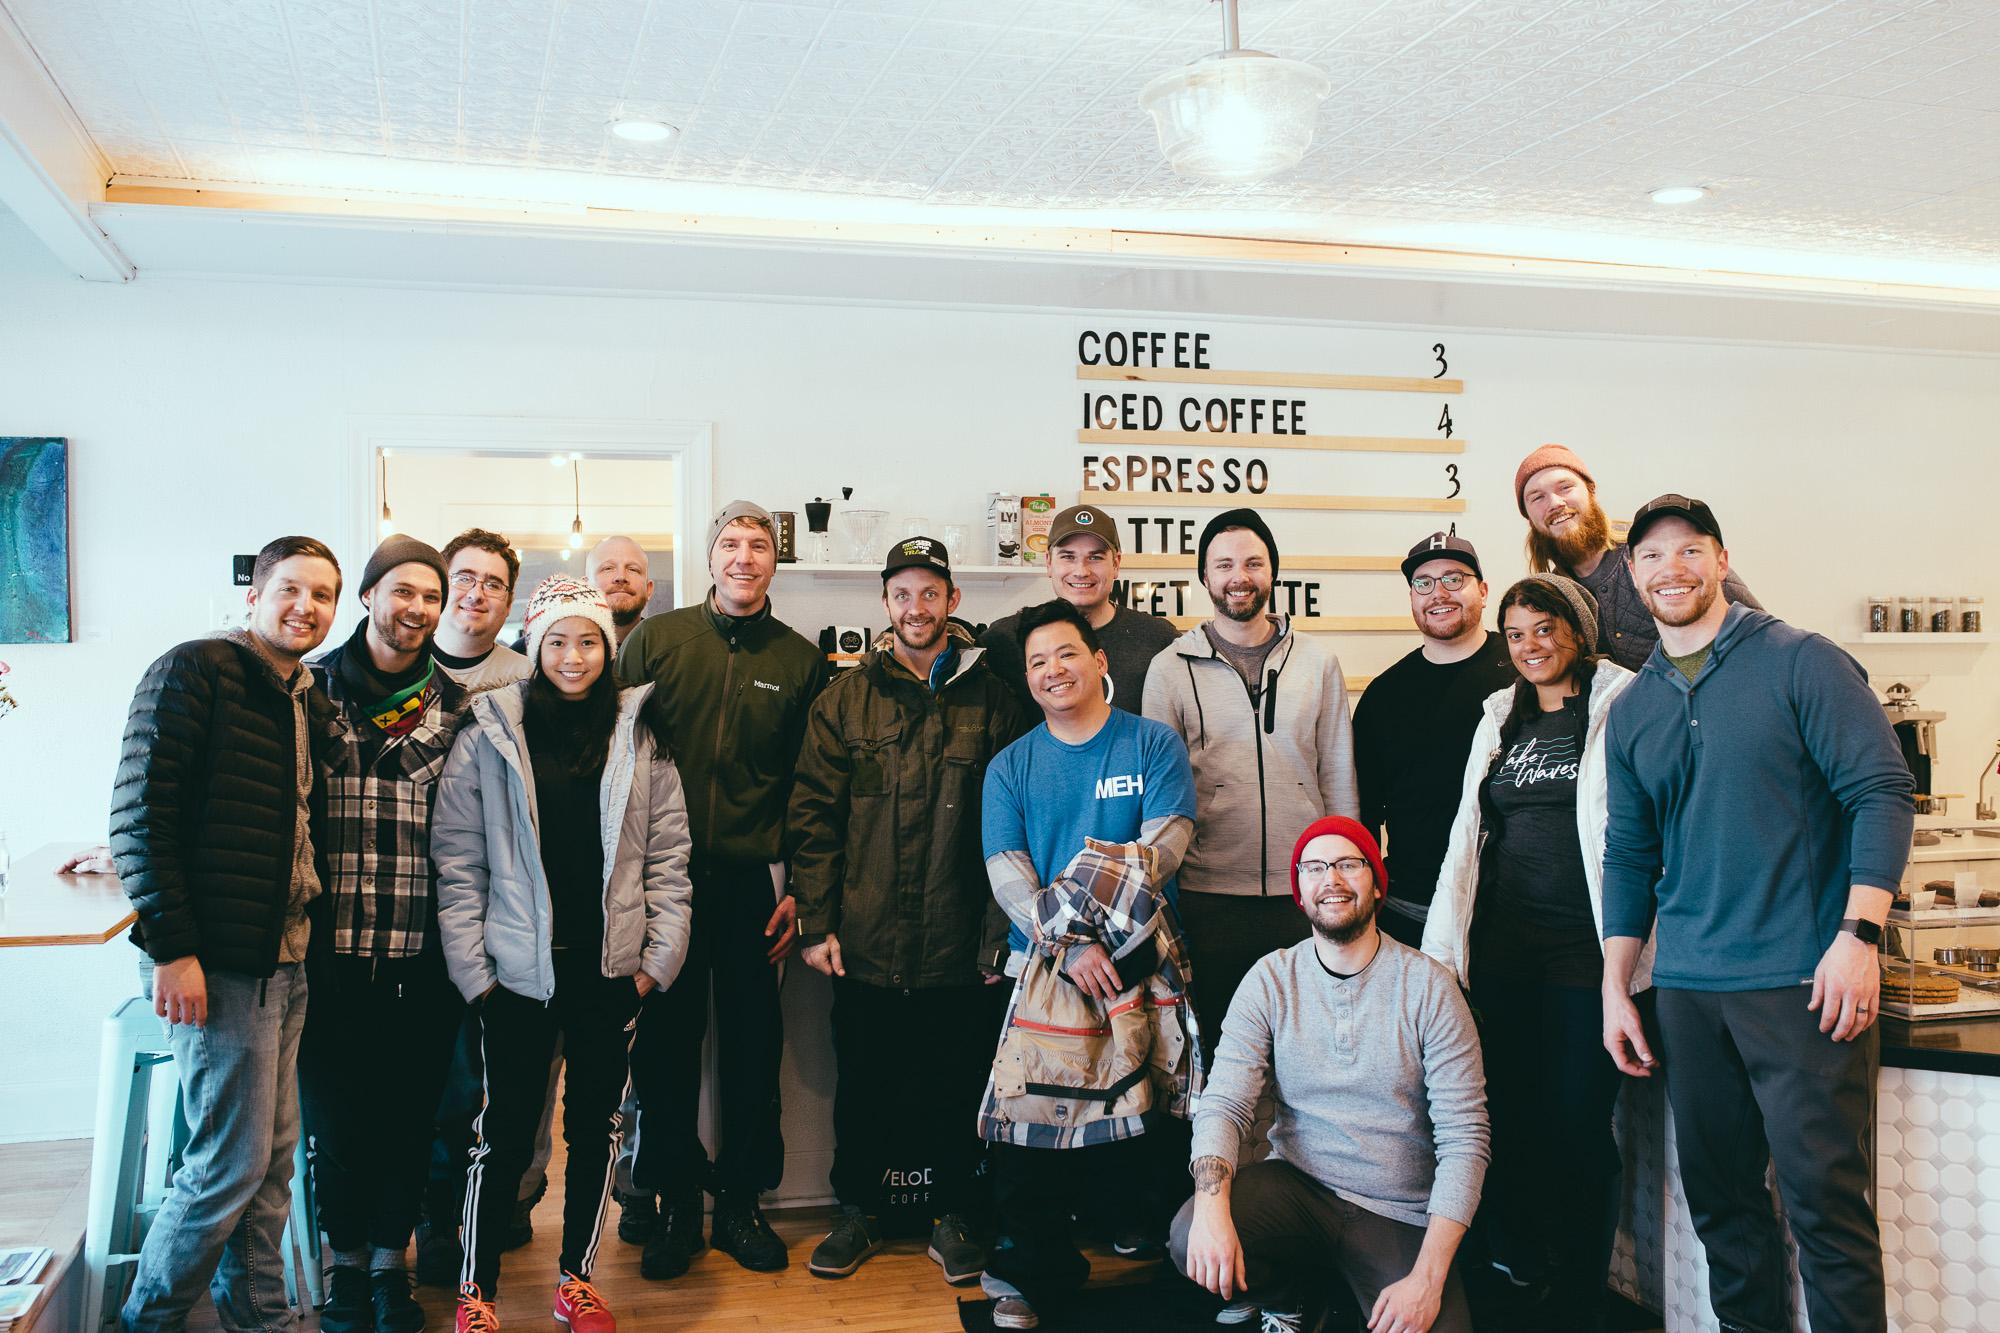 Group photo at coffee bar